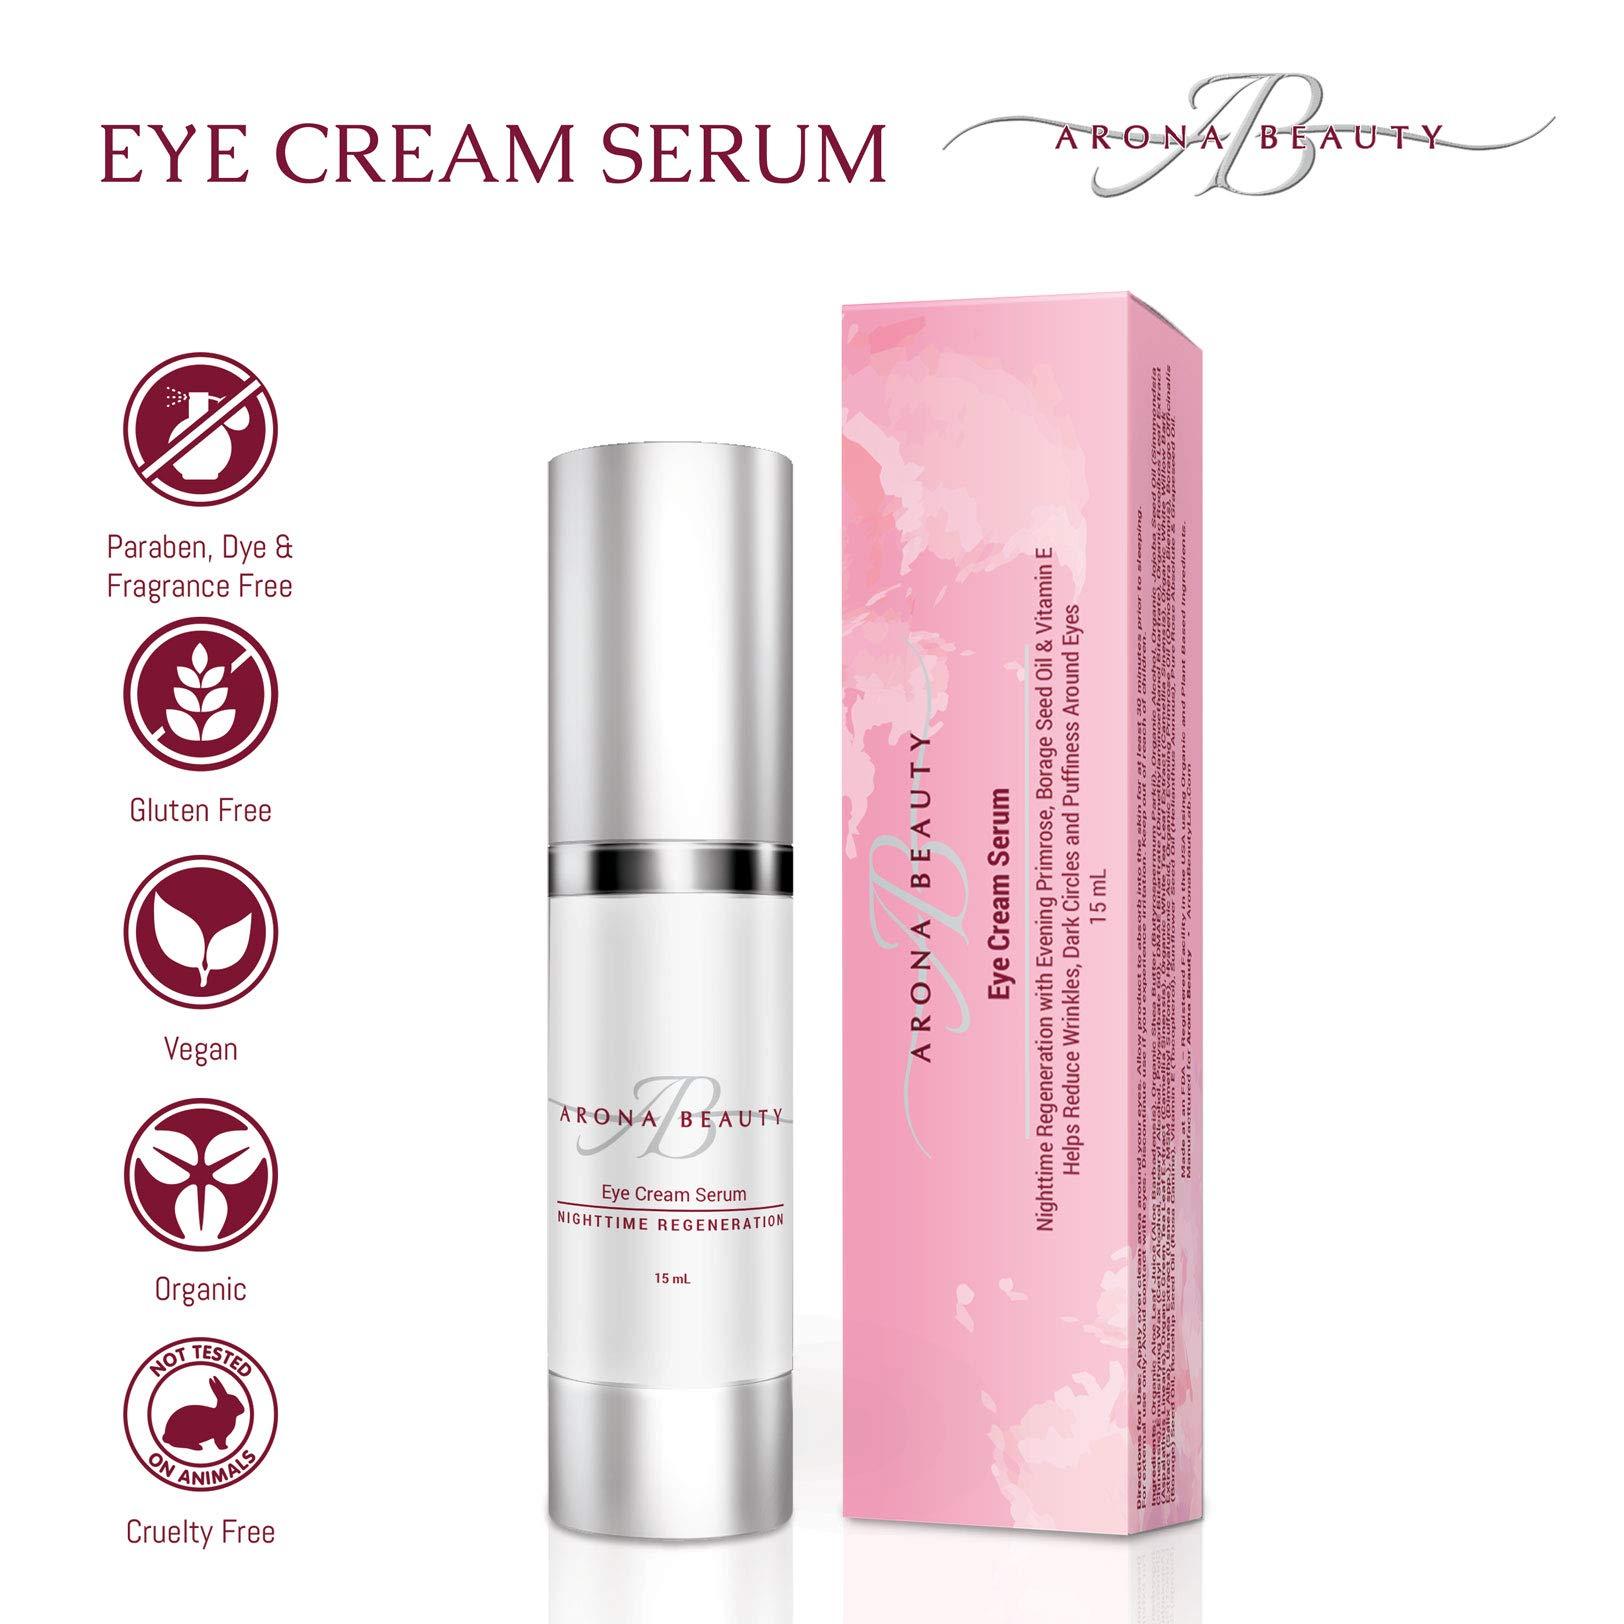 Eye Serum, Anti Aging Cream, Anti Wrinkle Cream - Organic Eye Cream Serum Reduces Eye Bags, Dark Circles, Puffiness - Cruelty Free, Sunflower Oil, Vitamin E, Antioxidant, Gluten Free, Reduces Wrinkles